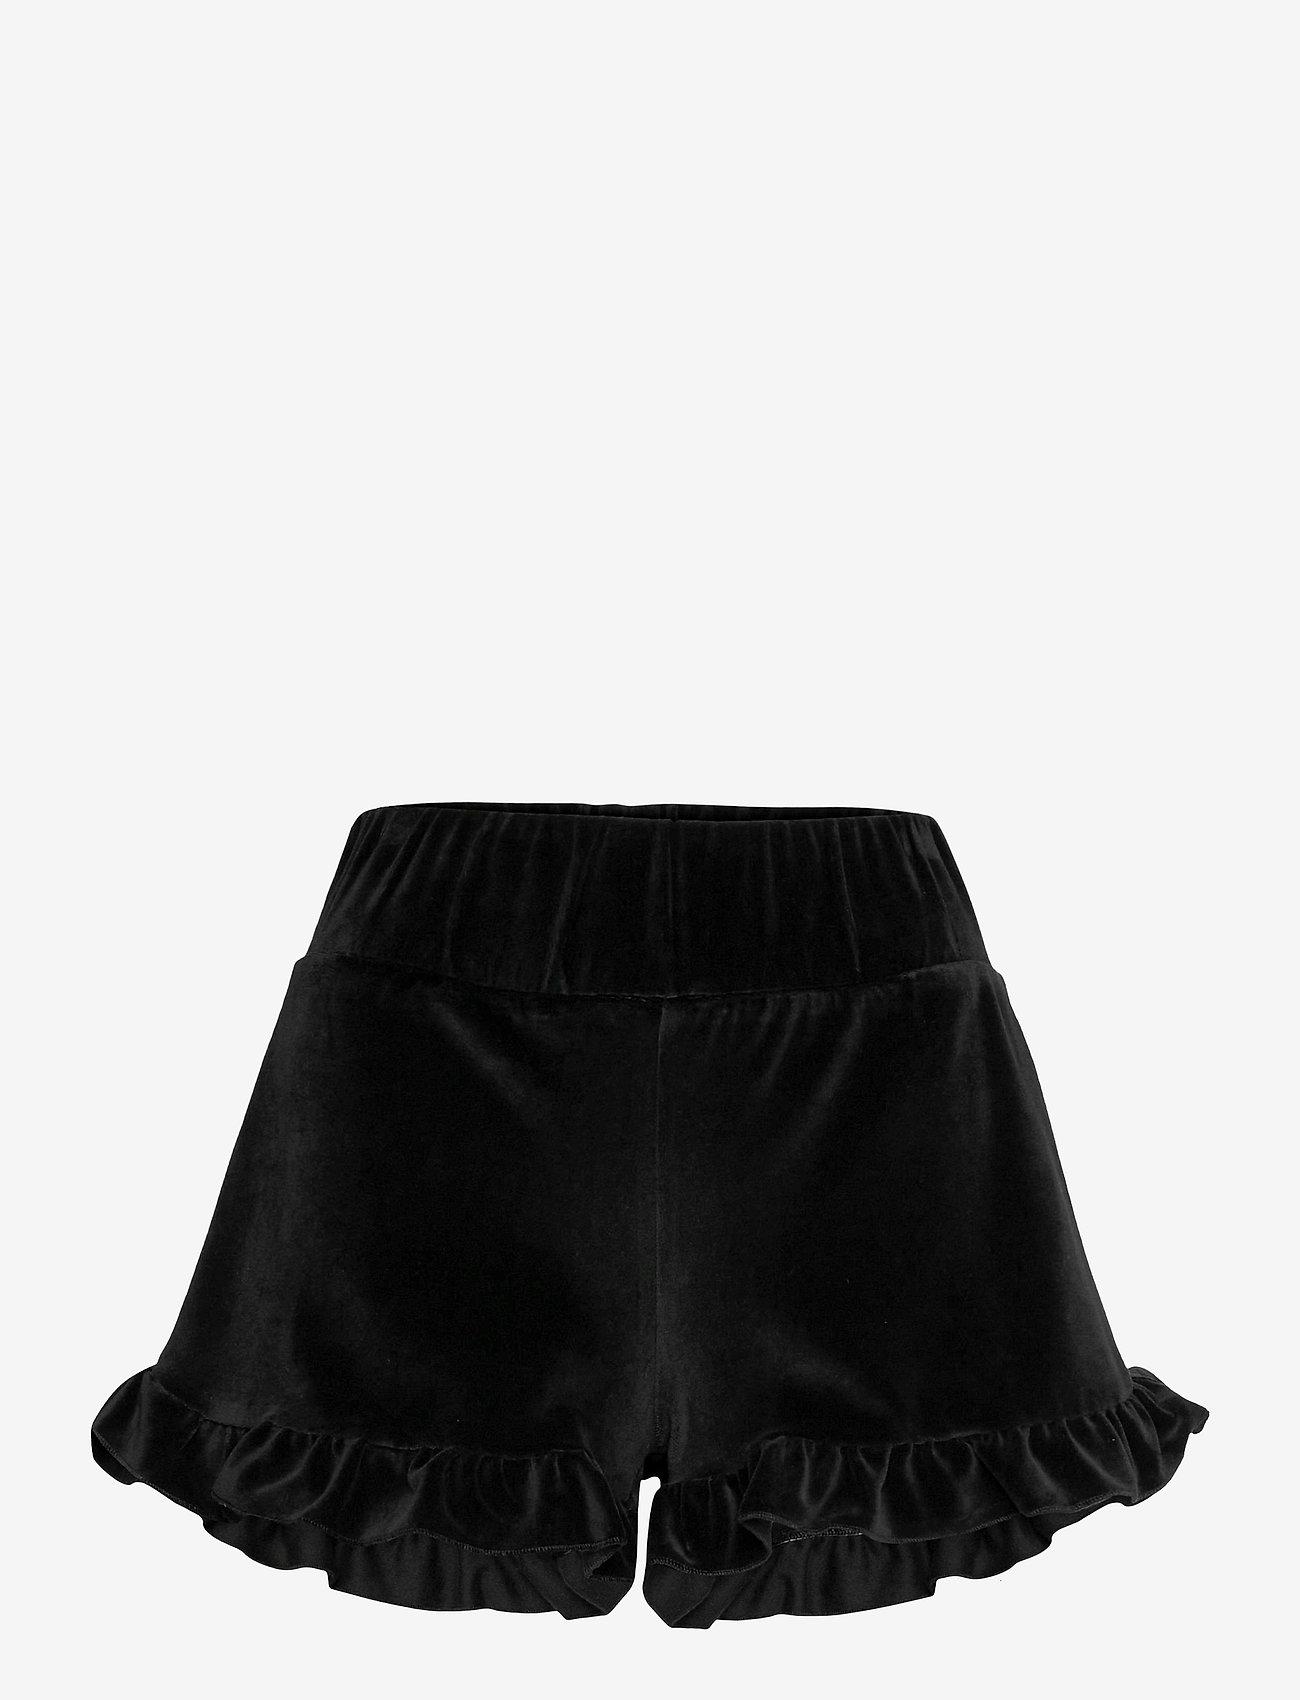 ella&il - Hay velour shorts - shorts casual - black - 0